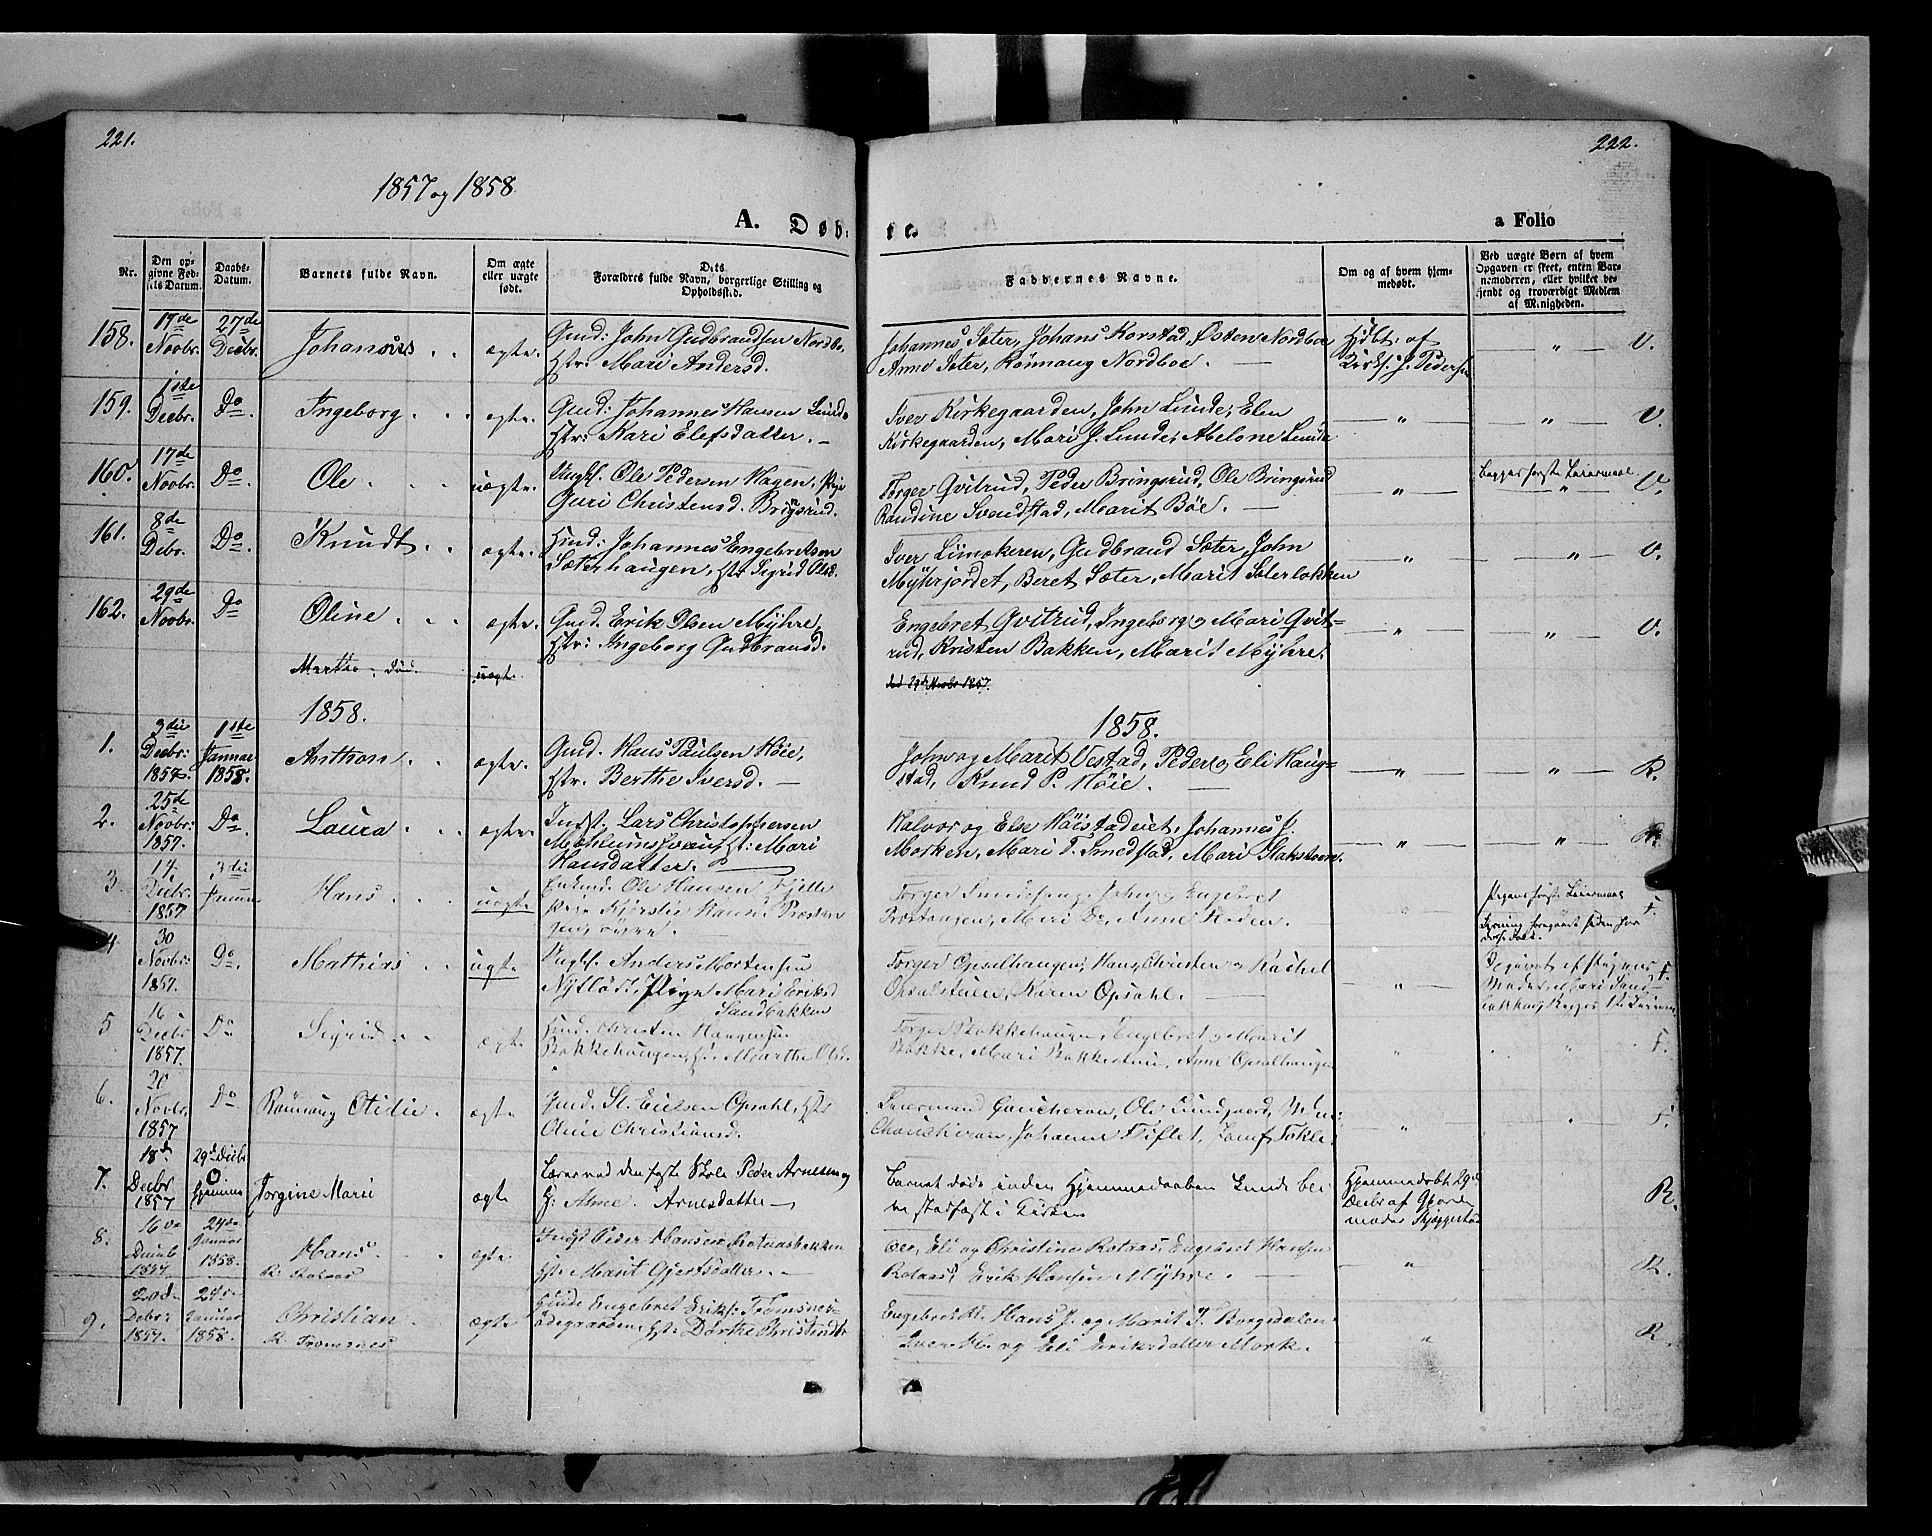 SAH, Ringebu prestekontor, Ministerialbok nr. 6, 1848-1859, s. 221-222